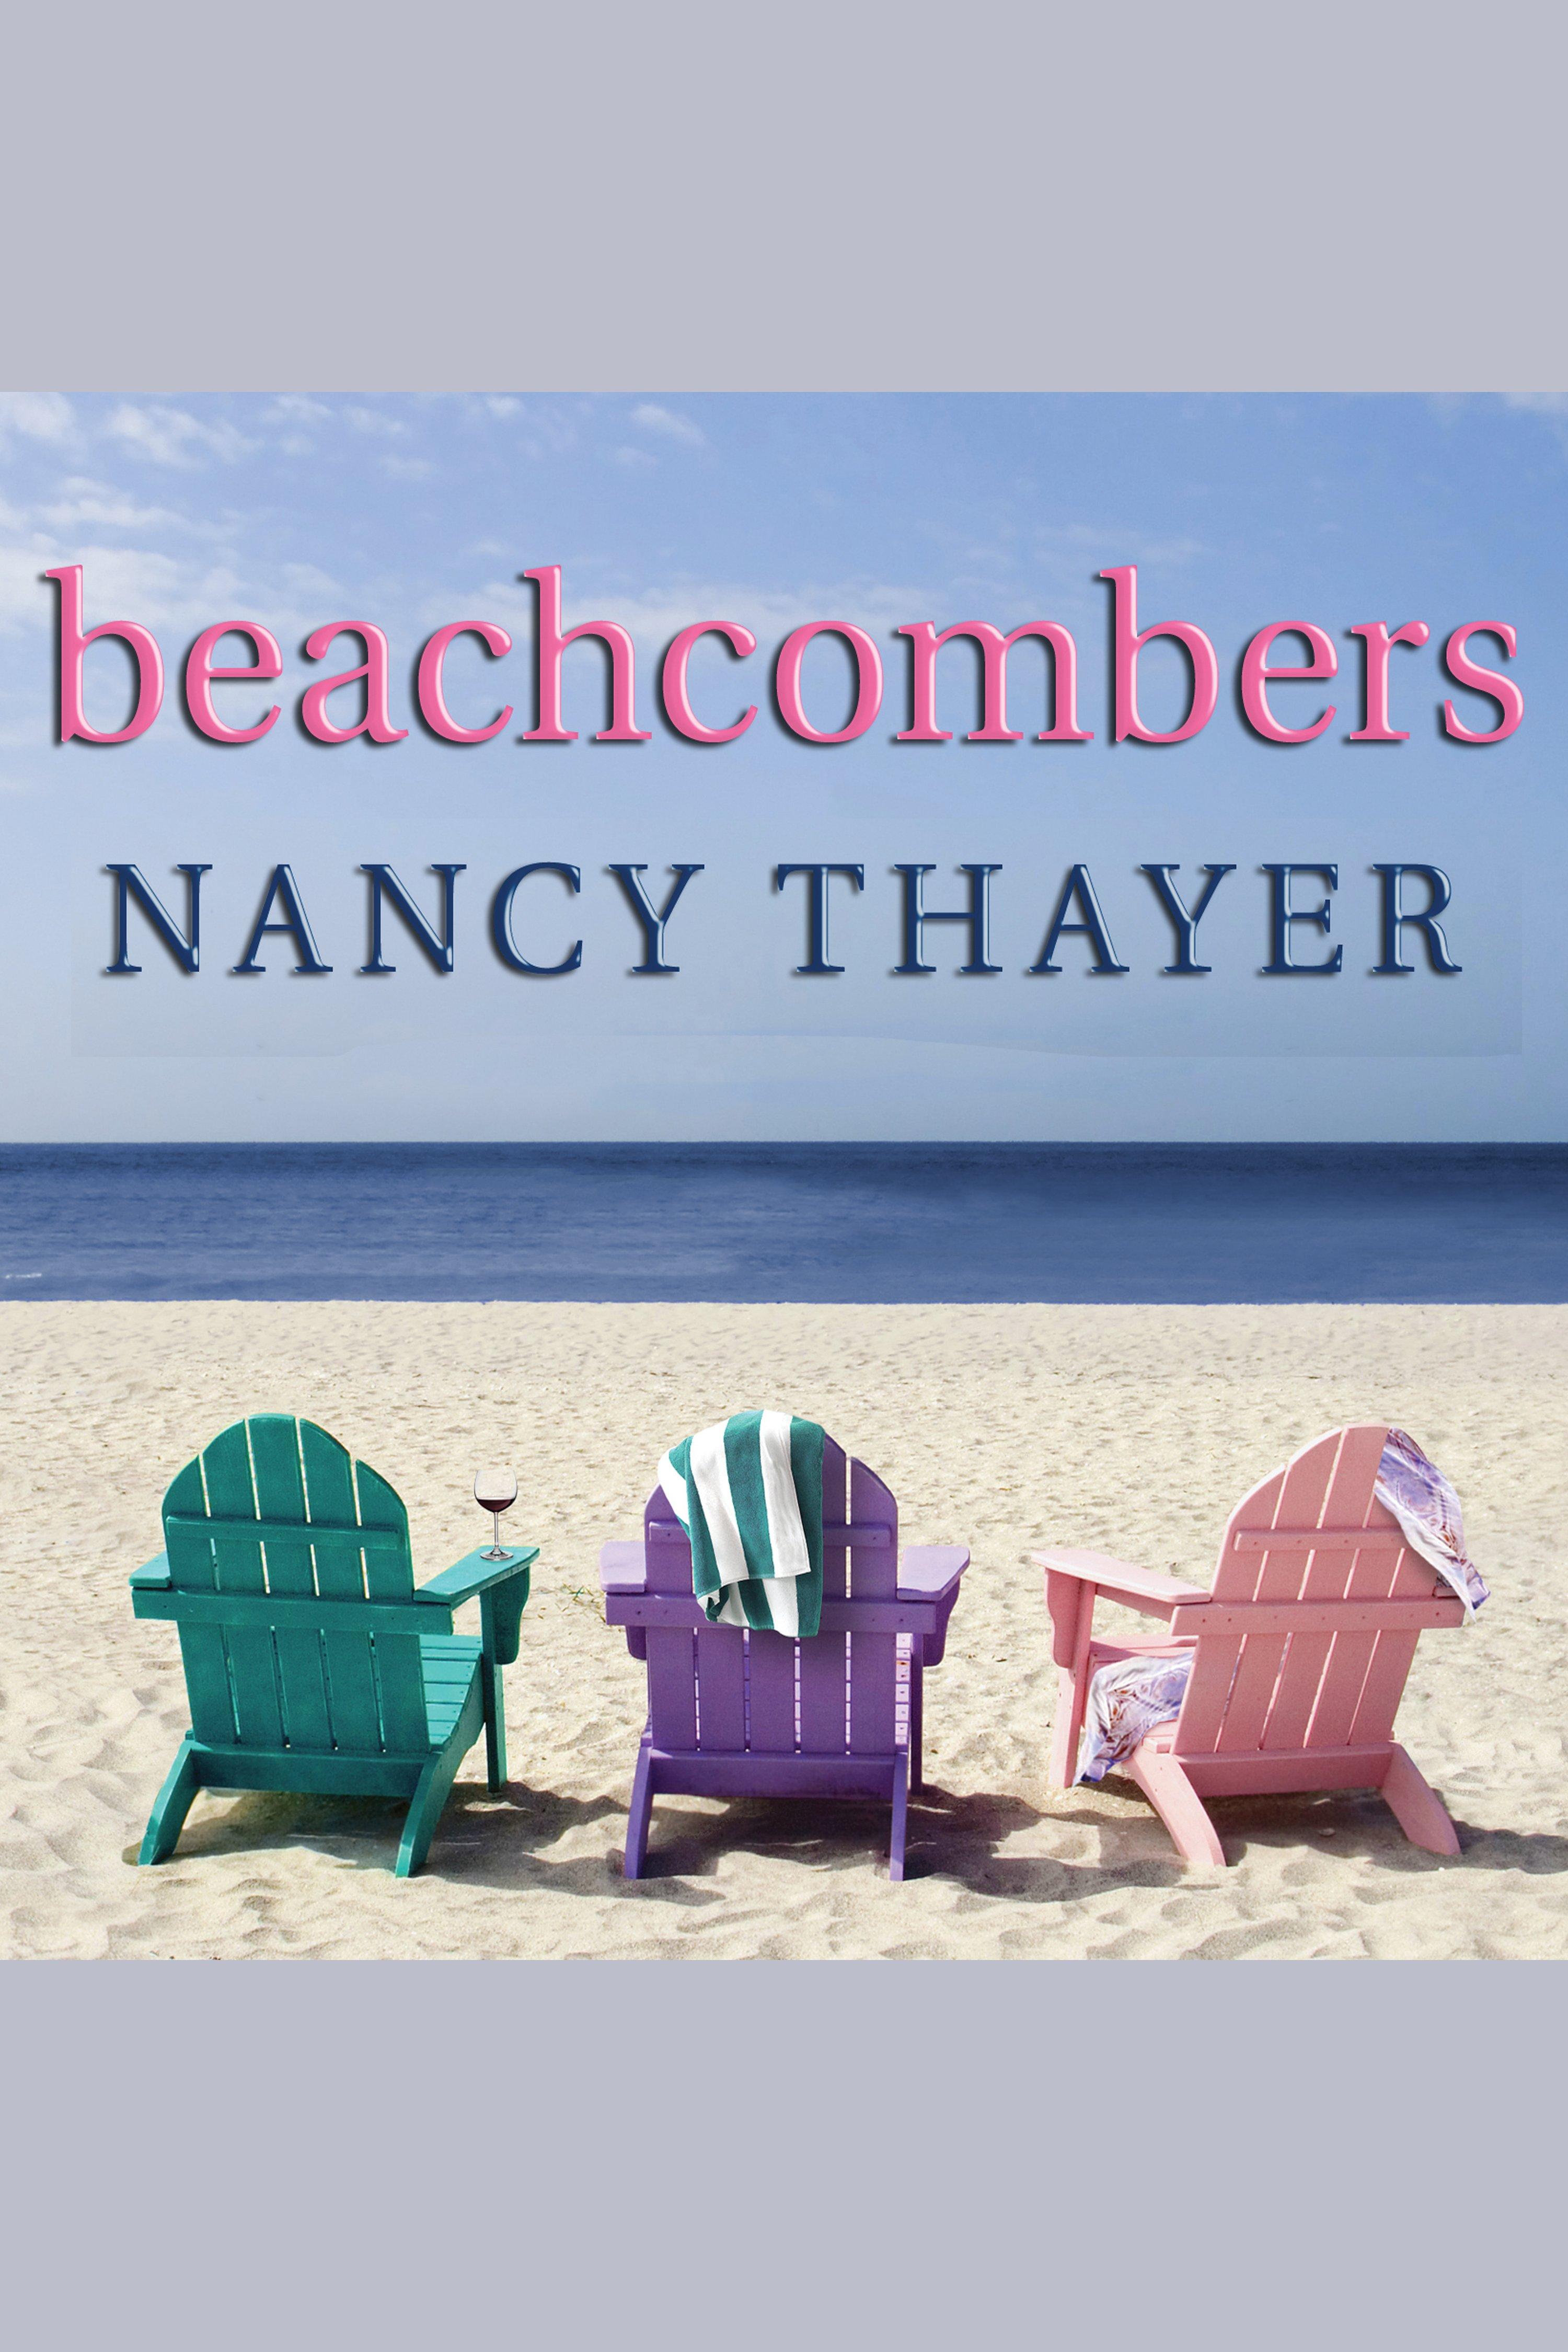 Beachcombers cover image